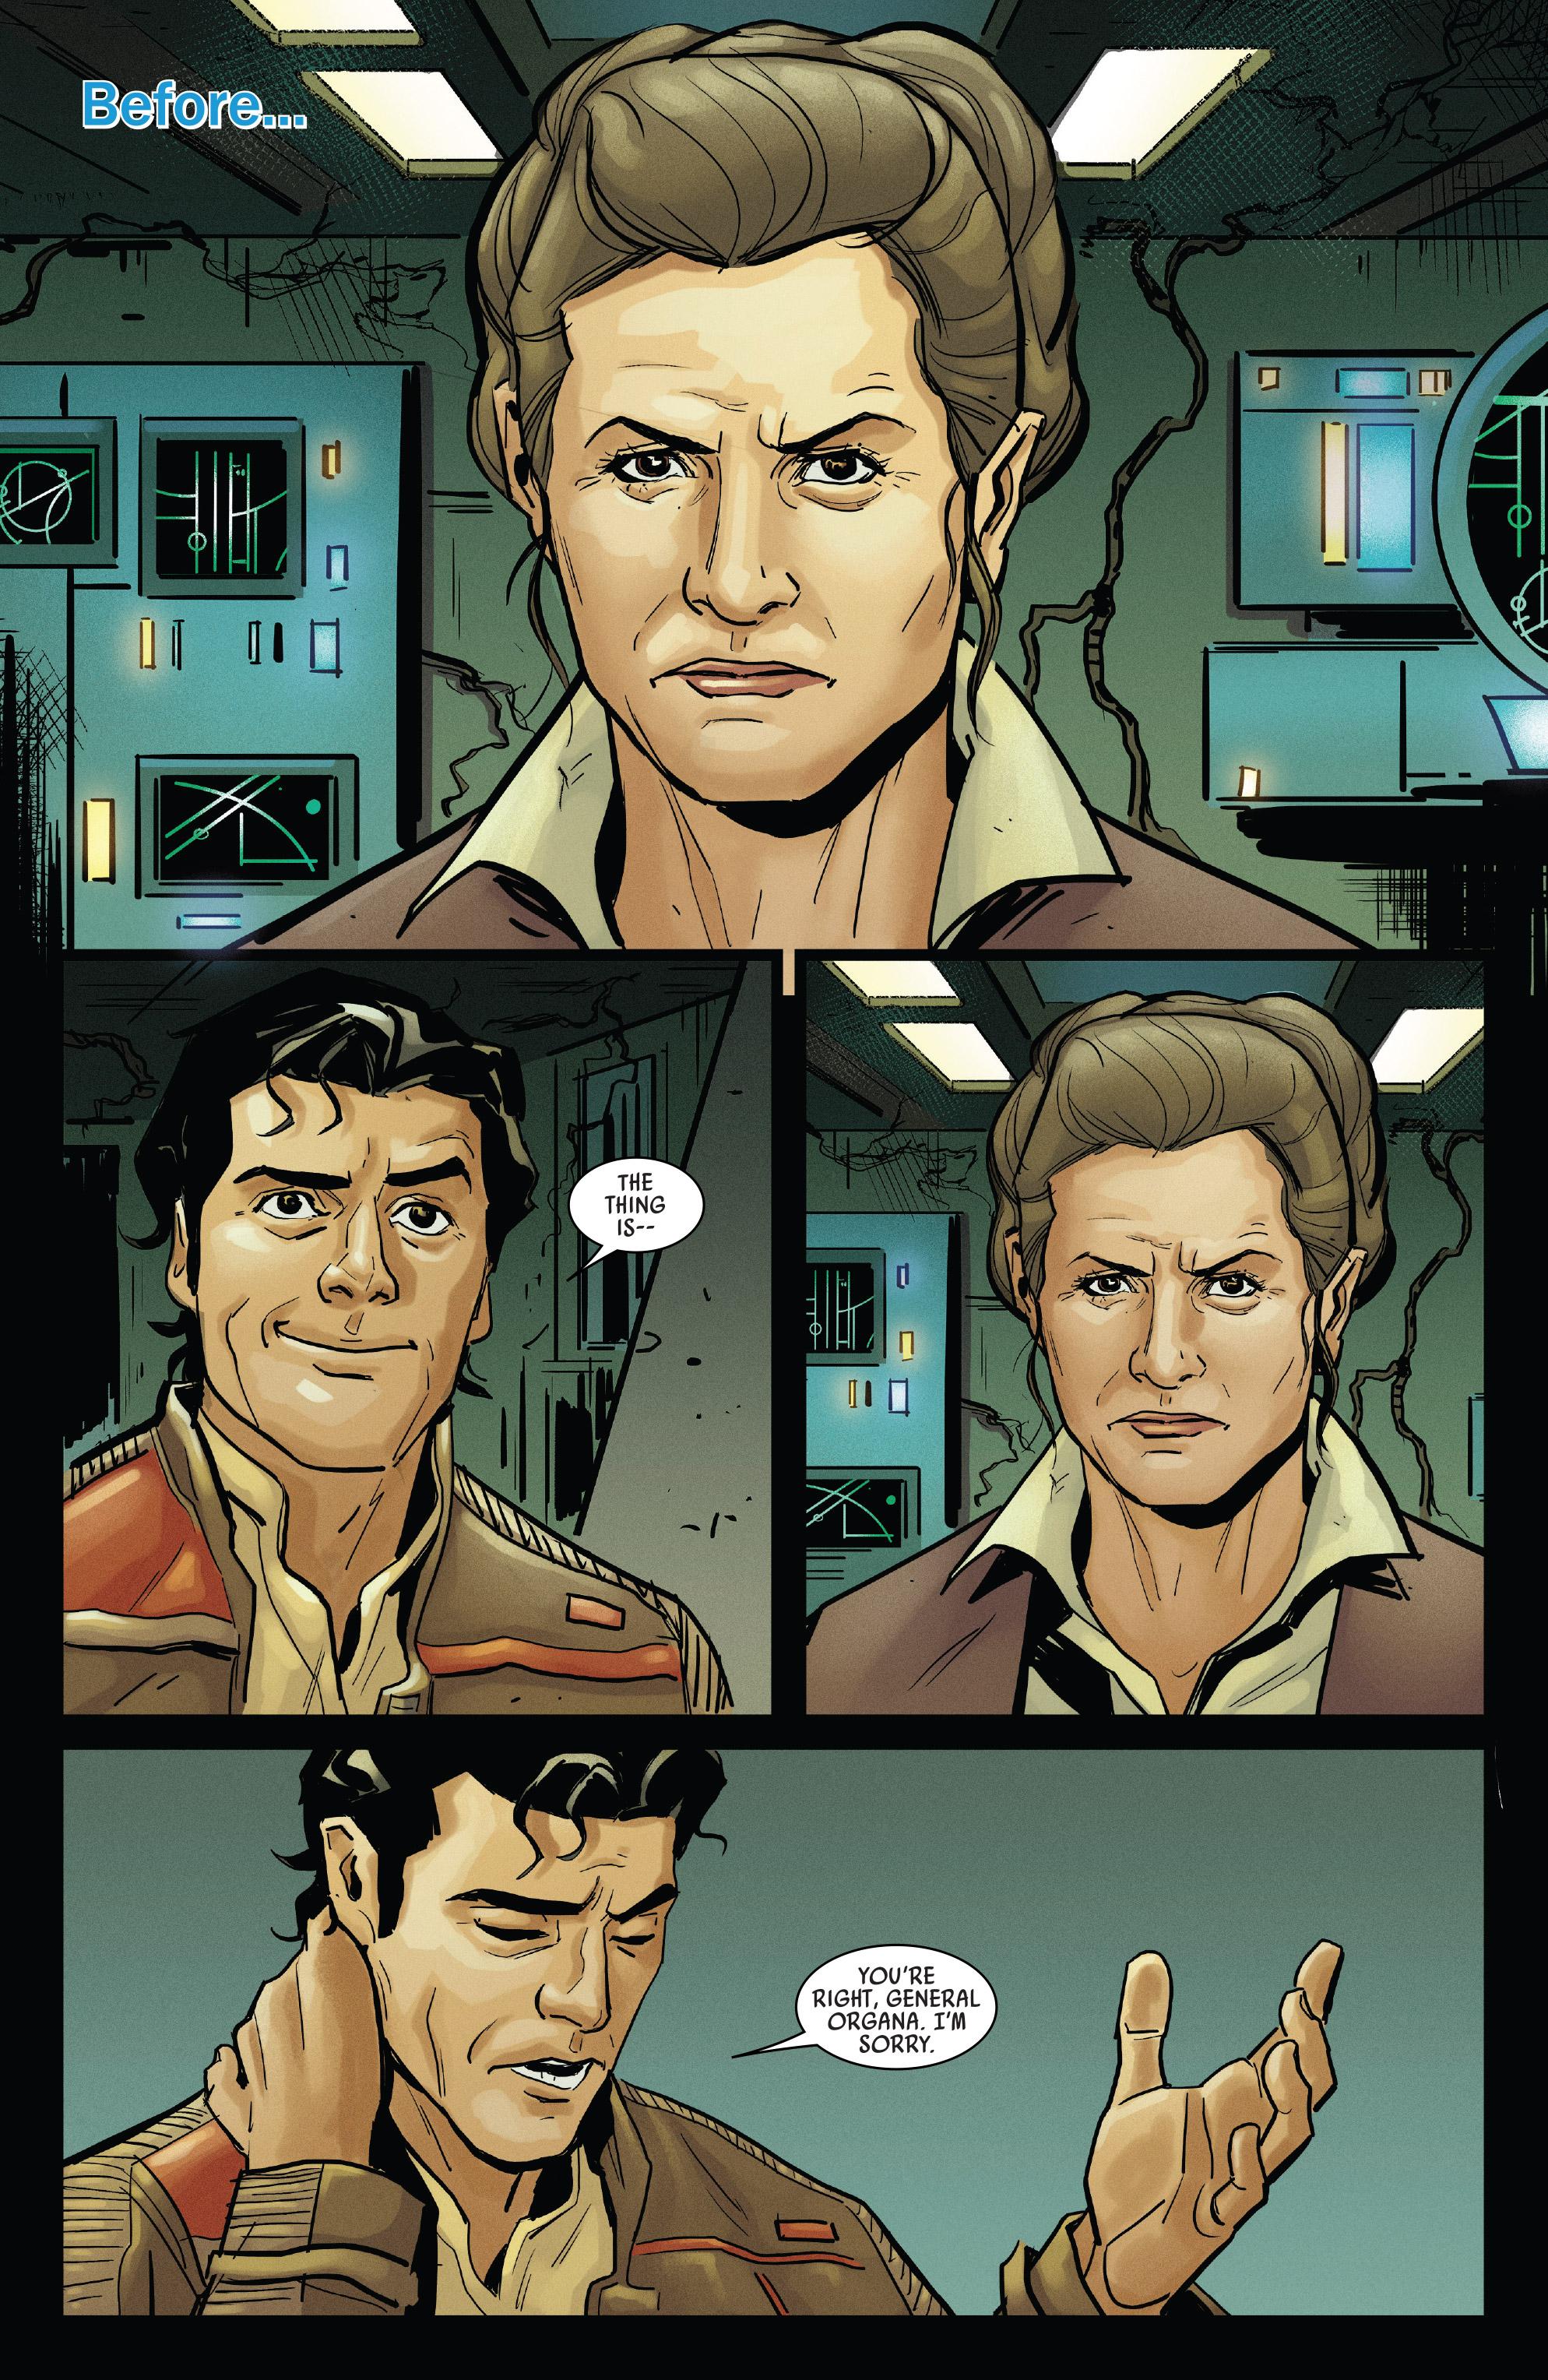 Read online Star Wars: Poe Dameron comic -  Issue # _Annual 1 - 3